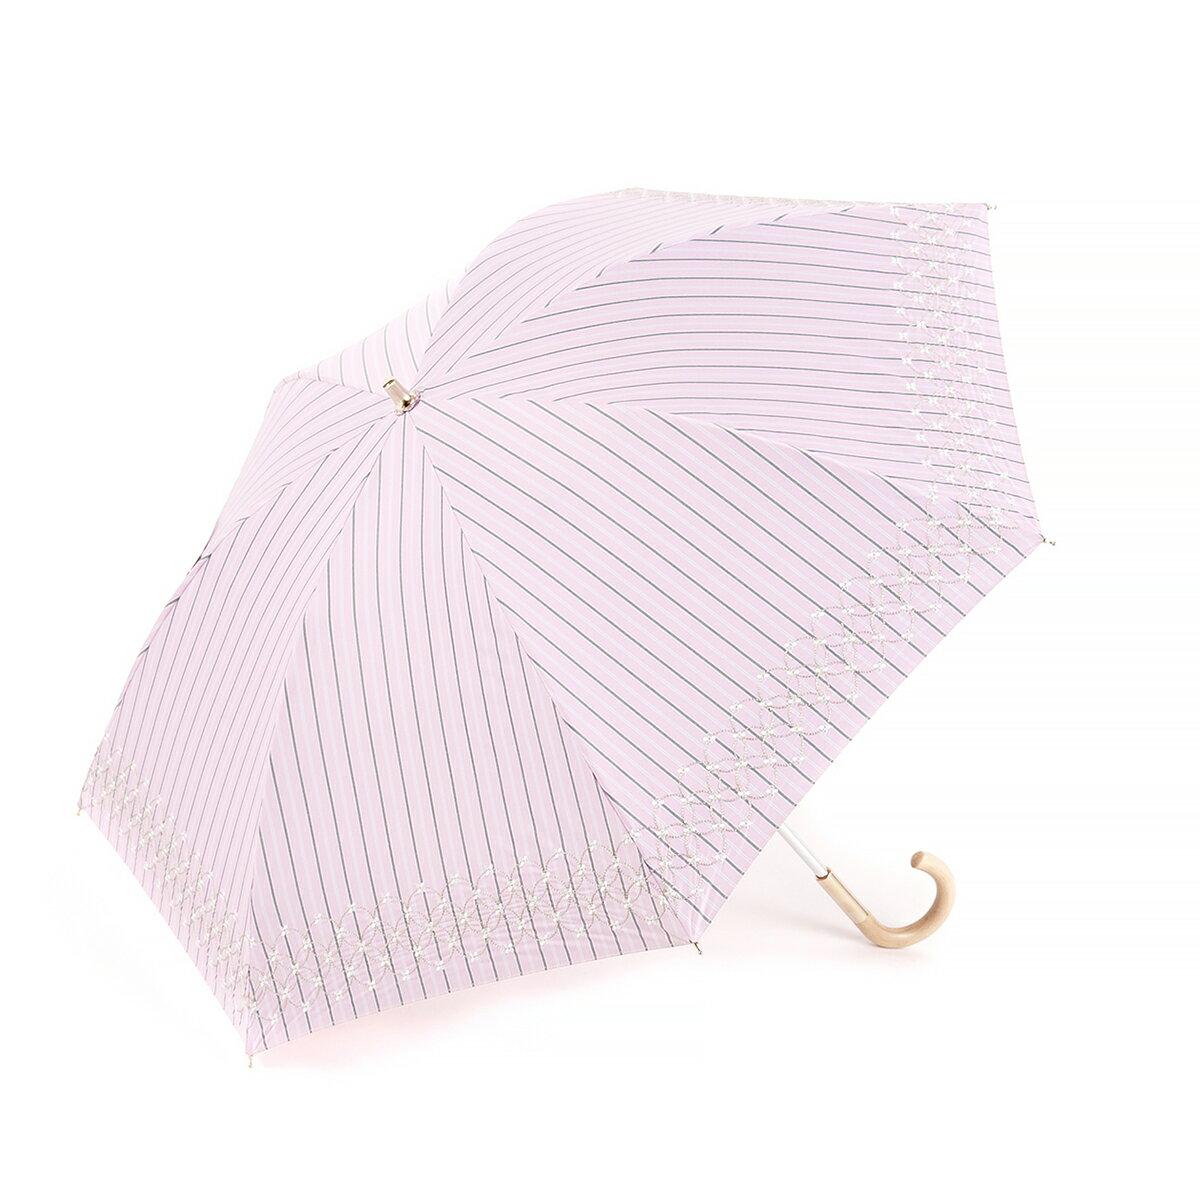 【ANTEPRIMA公式】アンテプリマ/ストライプ先染めラメ刺繍 晴雨兼用ショート傘/ピンク/ANTEPRIMA/E1AN230898/PINK